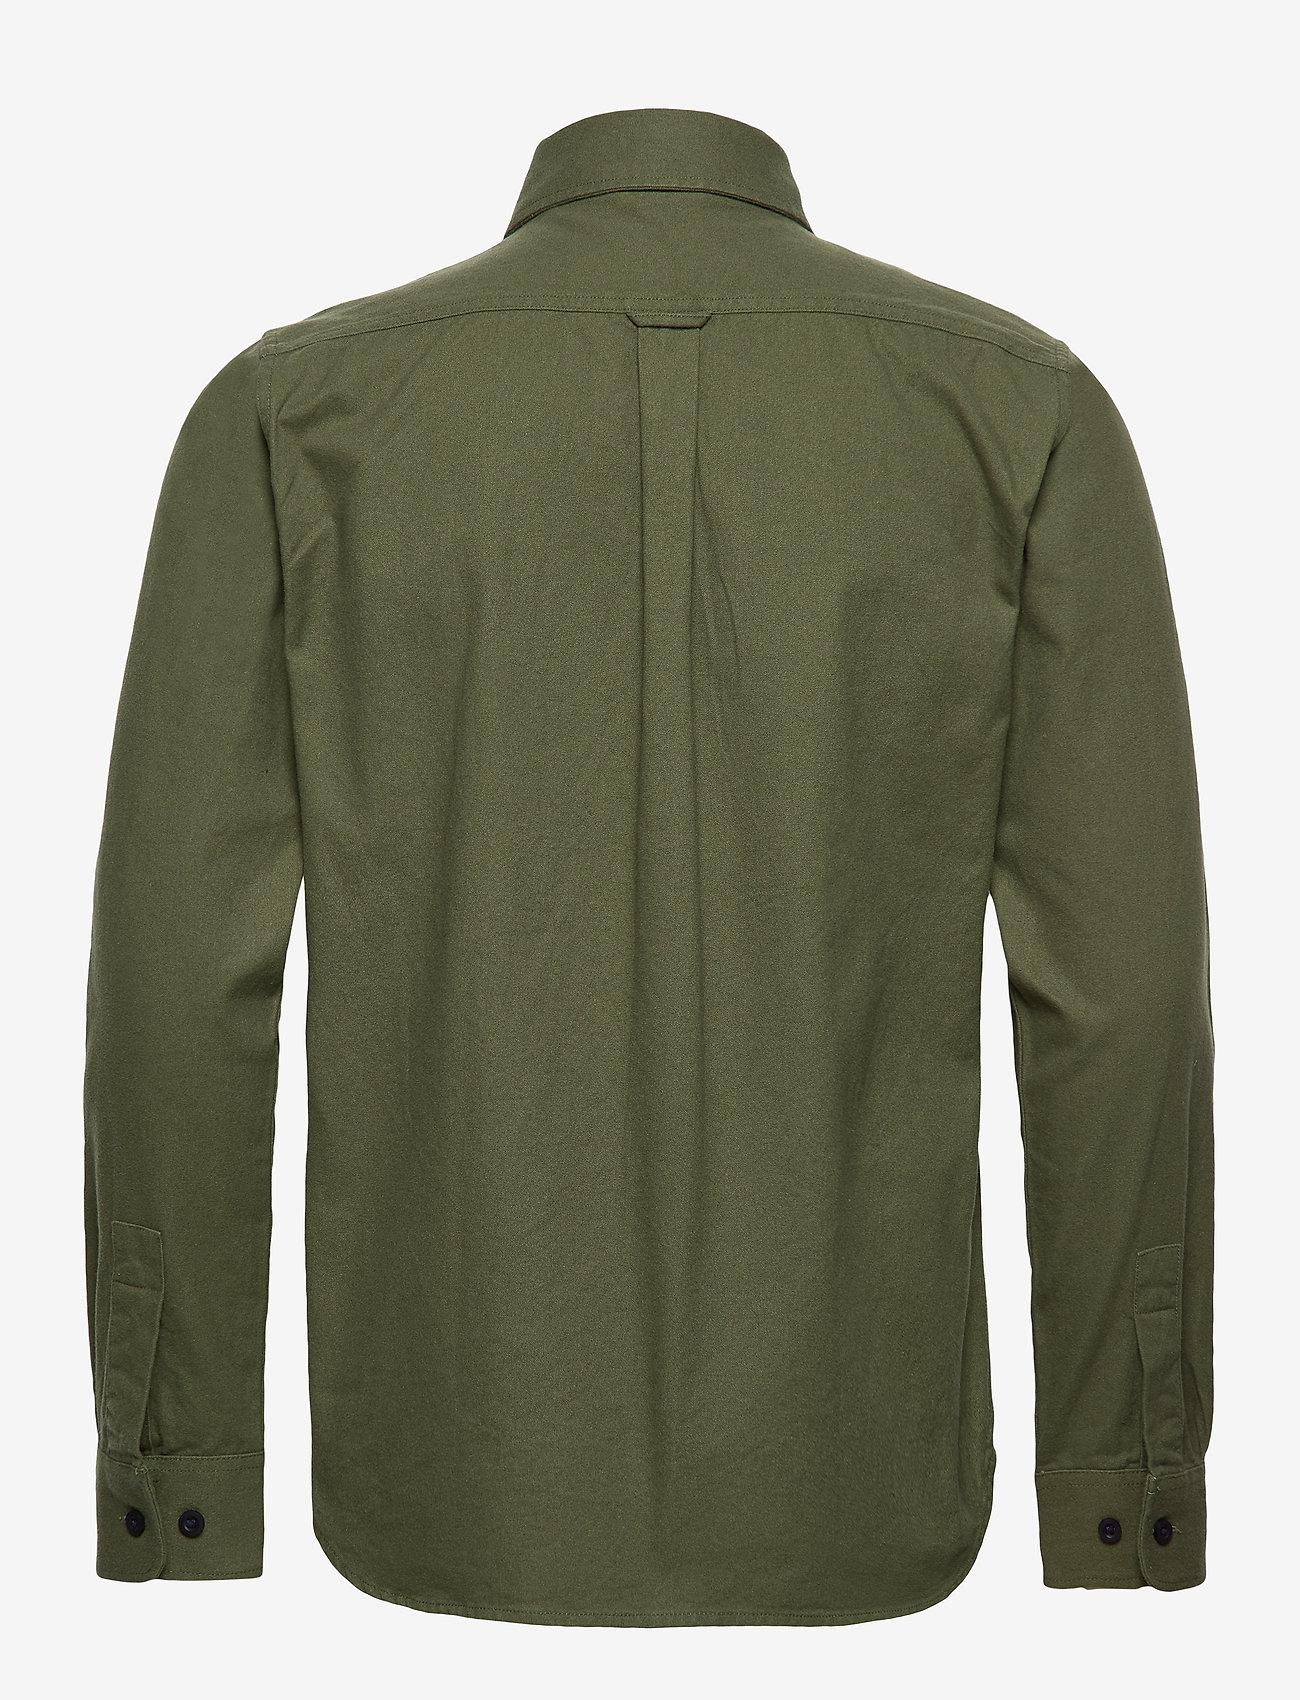 Long Sleeve Moleskin Shirt - Gots/v (Green Forest) - Knowledge Cotton Apparel ipdYq9